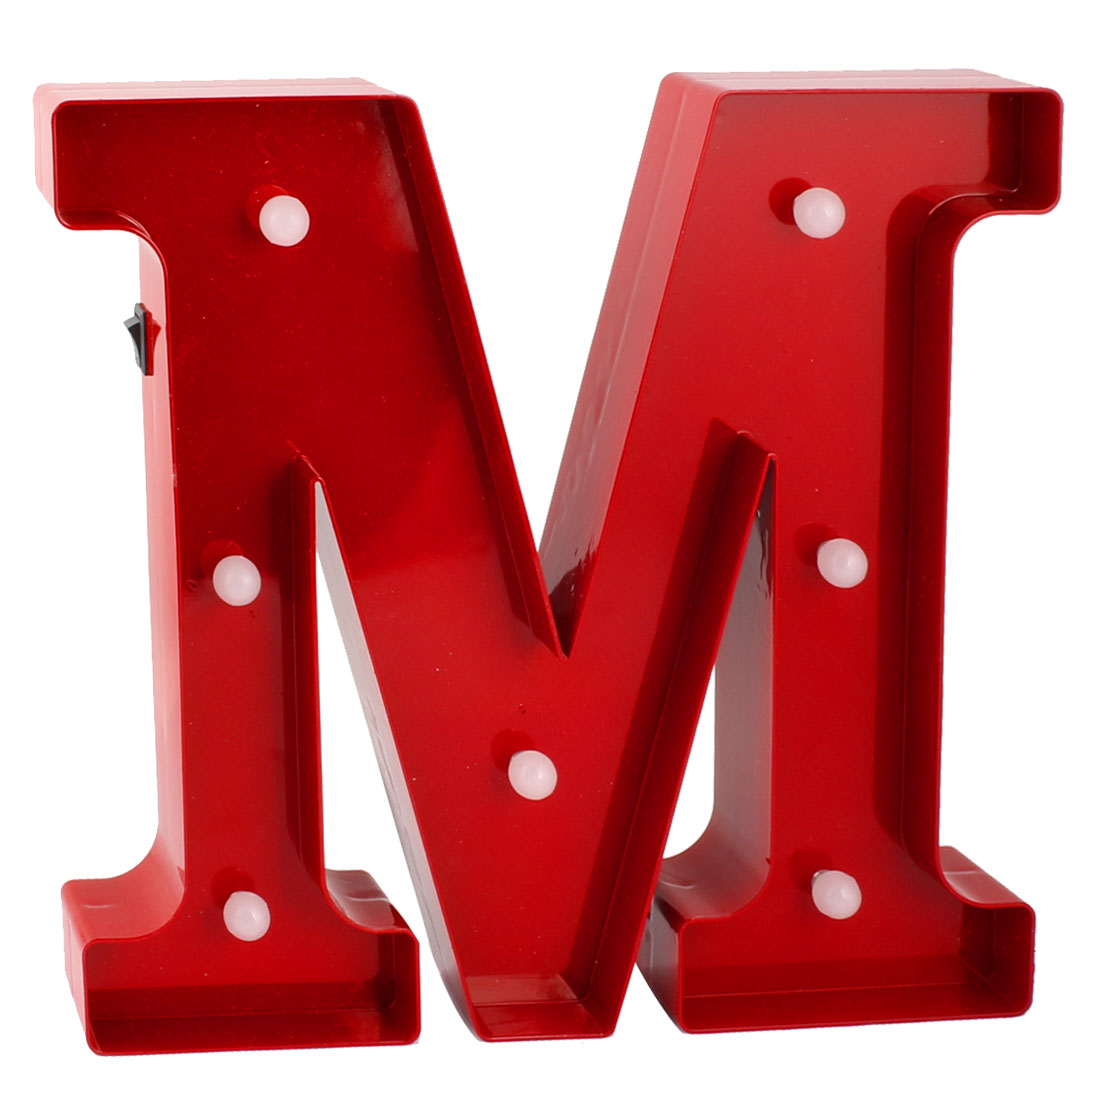 Coffee Shop Plastic Decor English M Letter Alphabet DIY Hanging LED Light Red - image 4 de 4